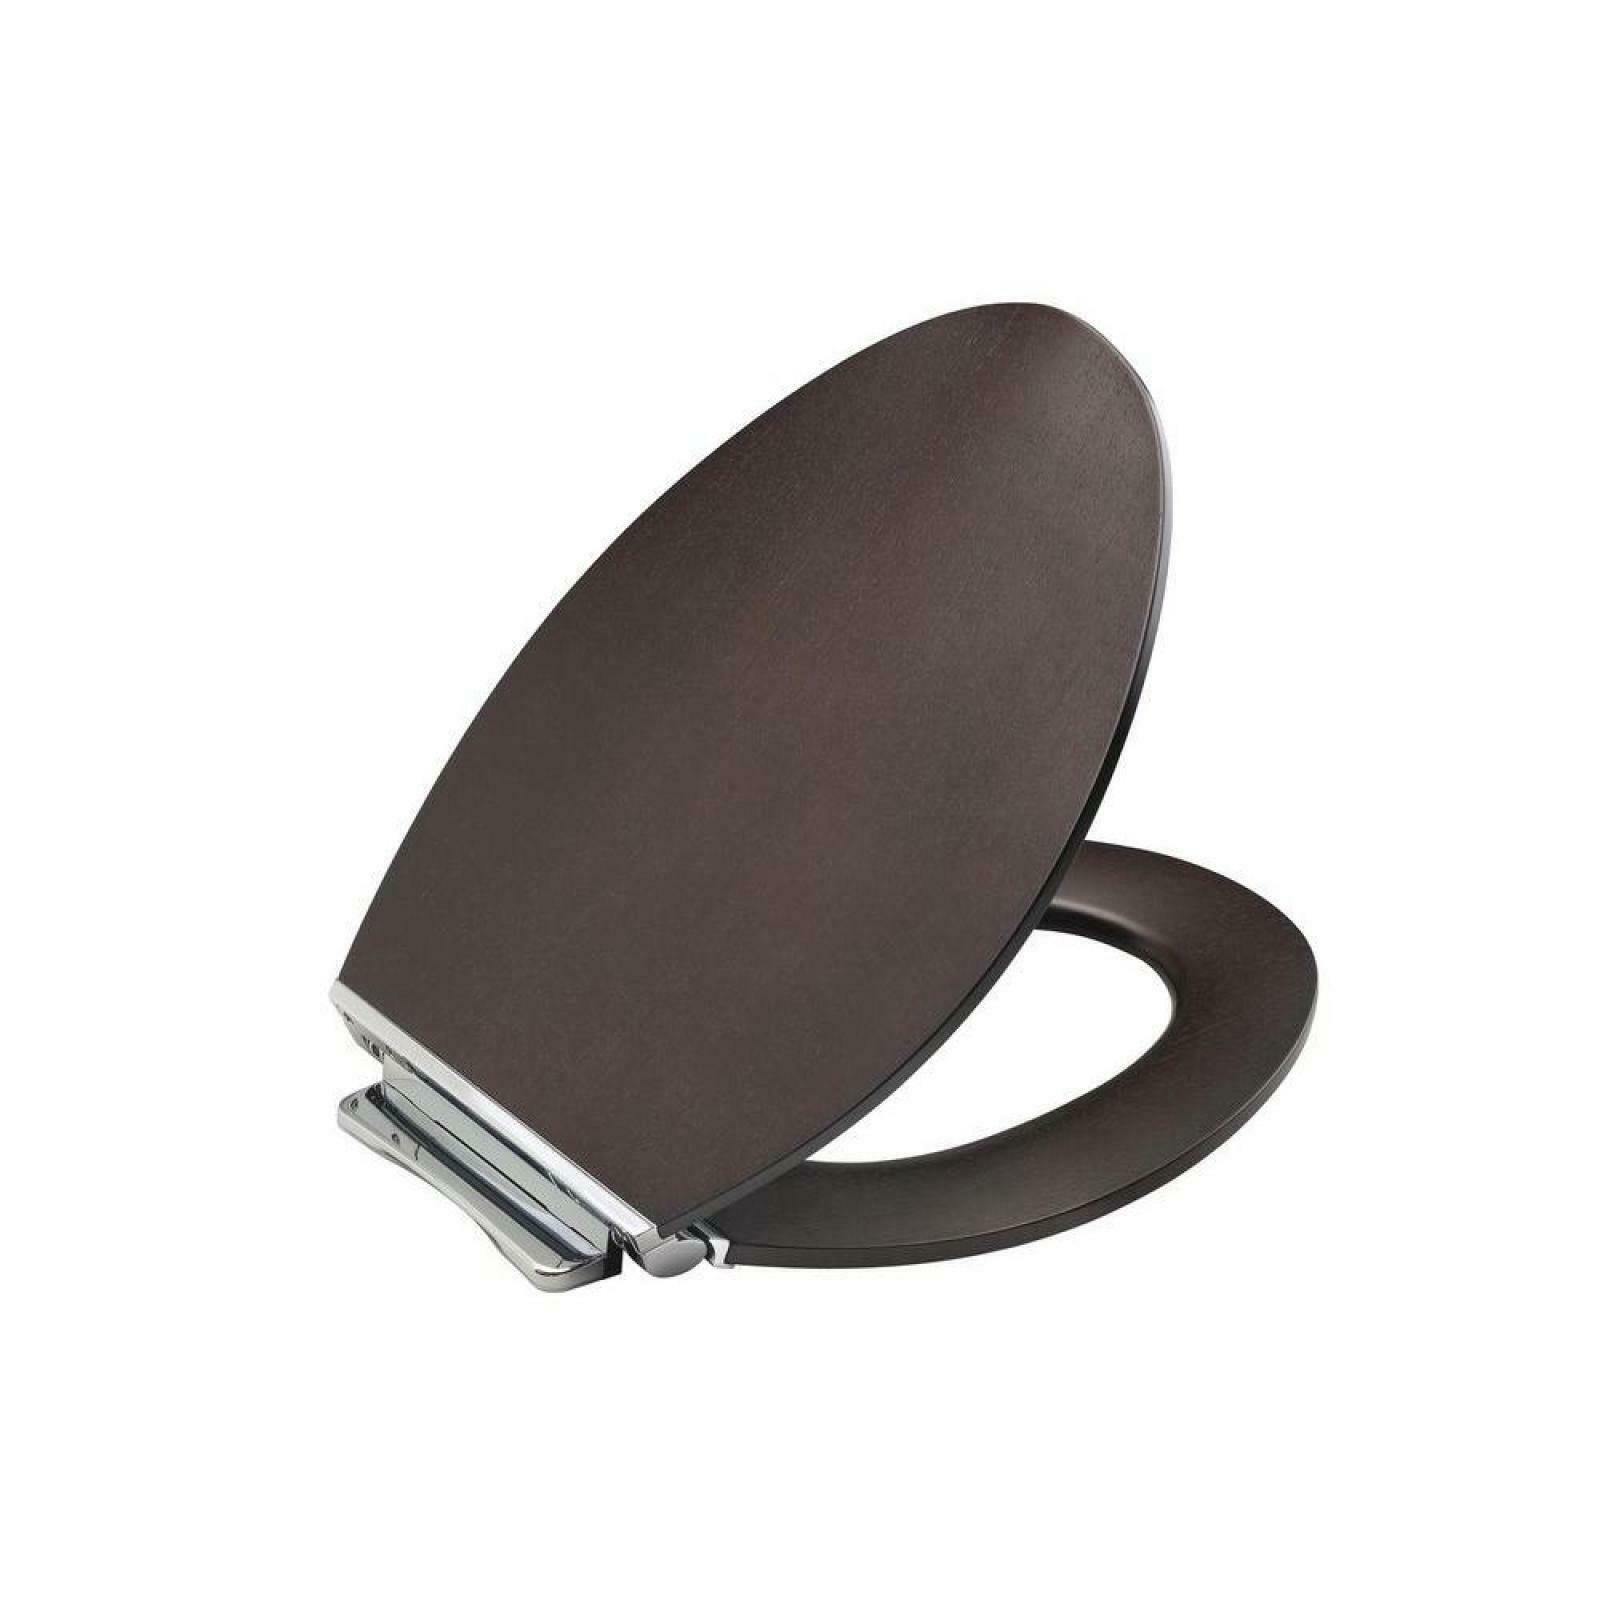 Brilliant Details About Kohler Elongated Toilet Seat Contoured Quiet Close Lid Metal Hinge Wood Brown Inzonedesignstudio Interior Chair Design Inzonedesignstudiocom